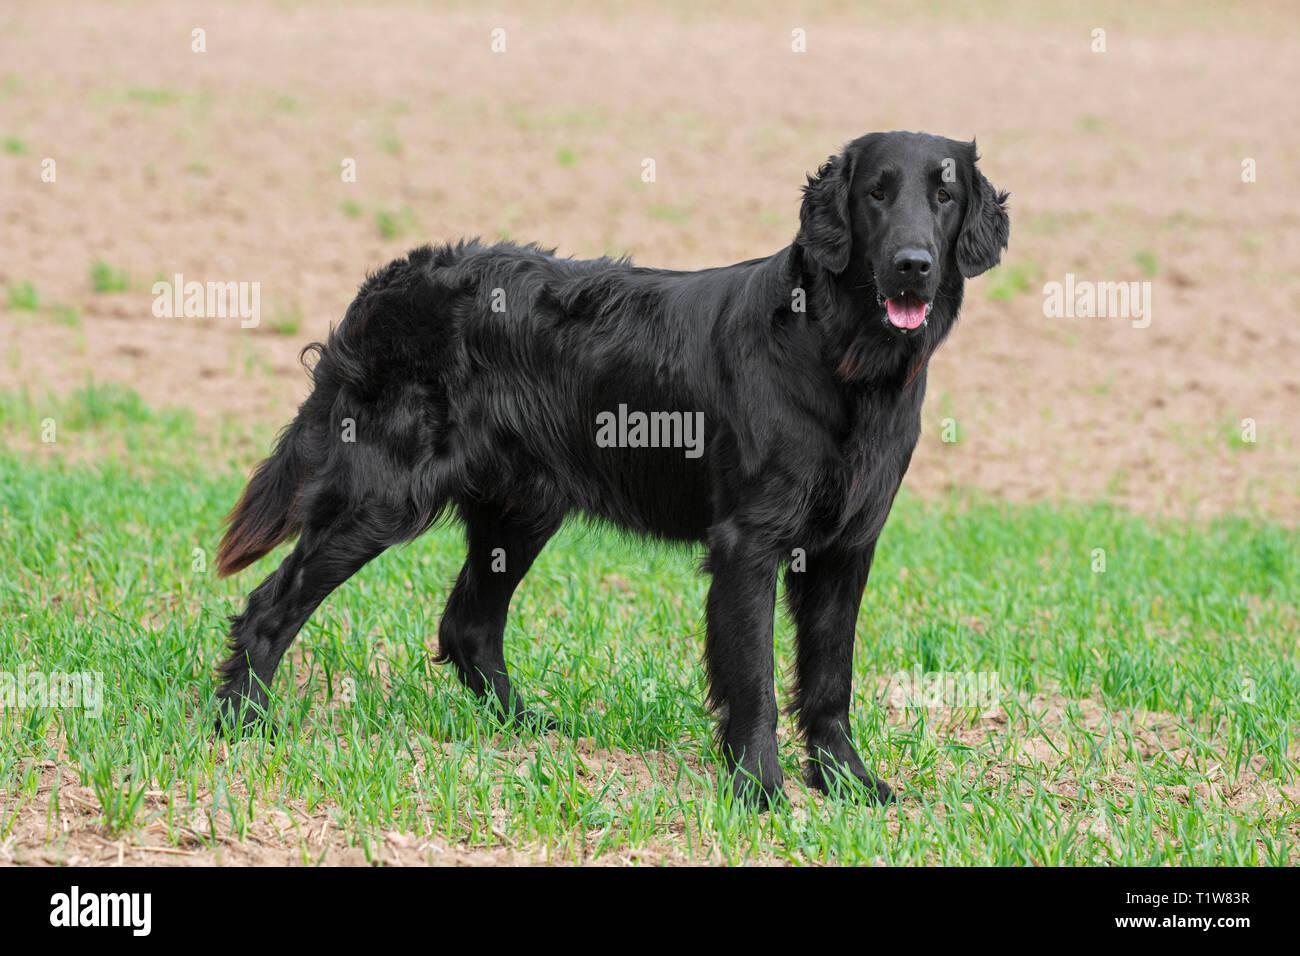 Black flat-coated retriever in field, gundog / gun dog breed originating from the United Kingdom - Stock Image